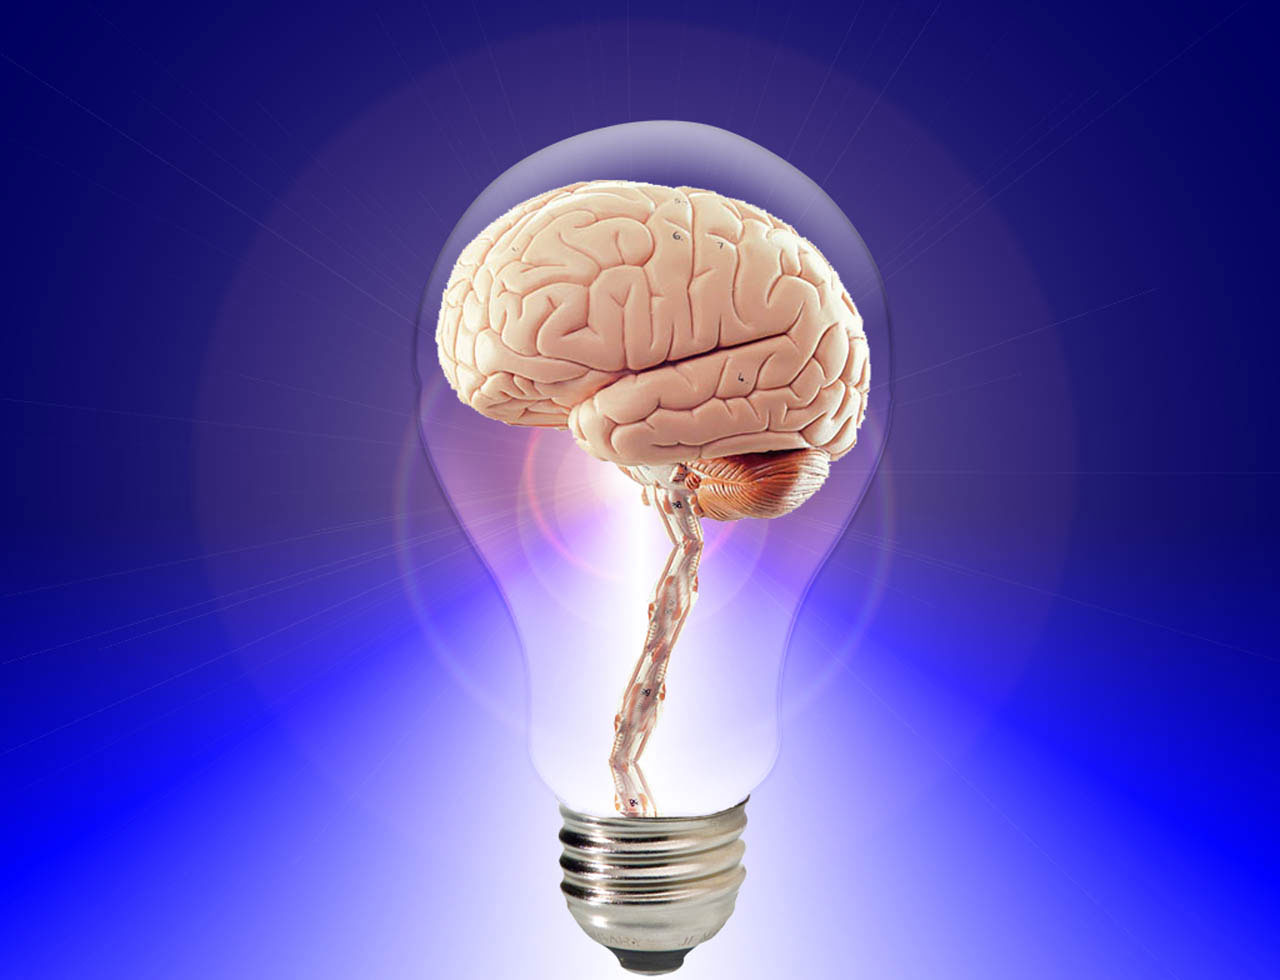 brain-light-bulb